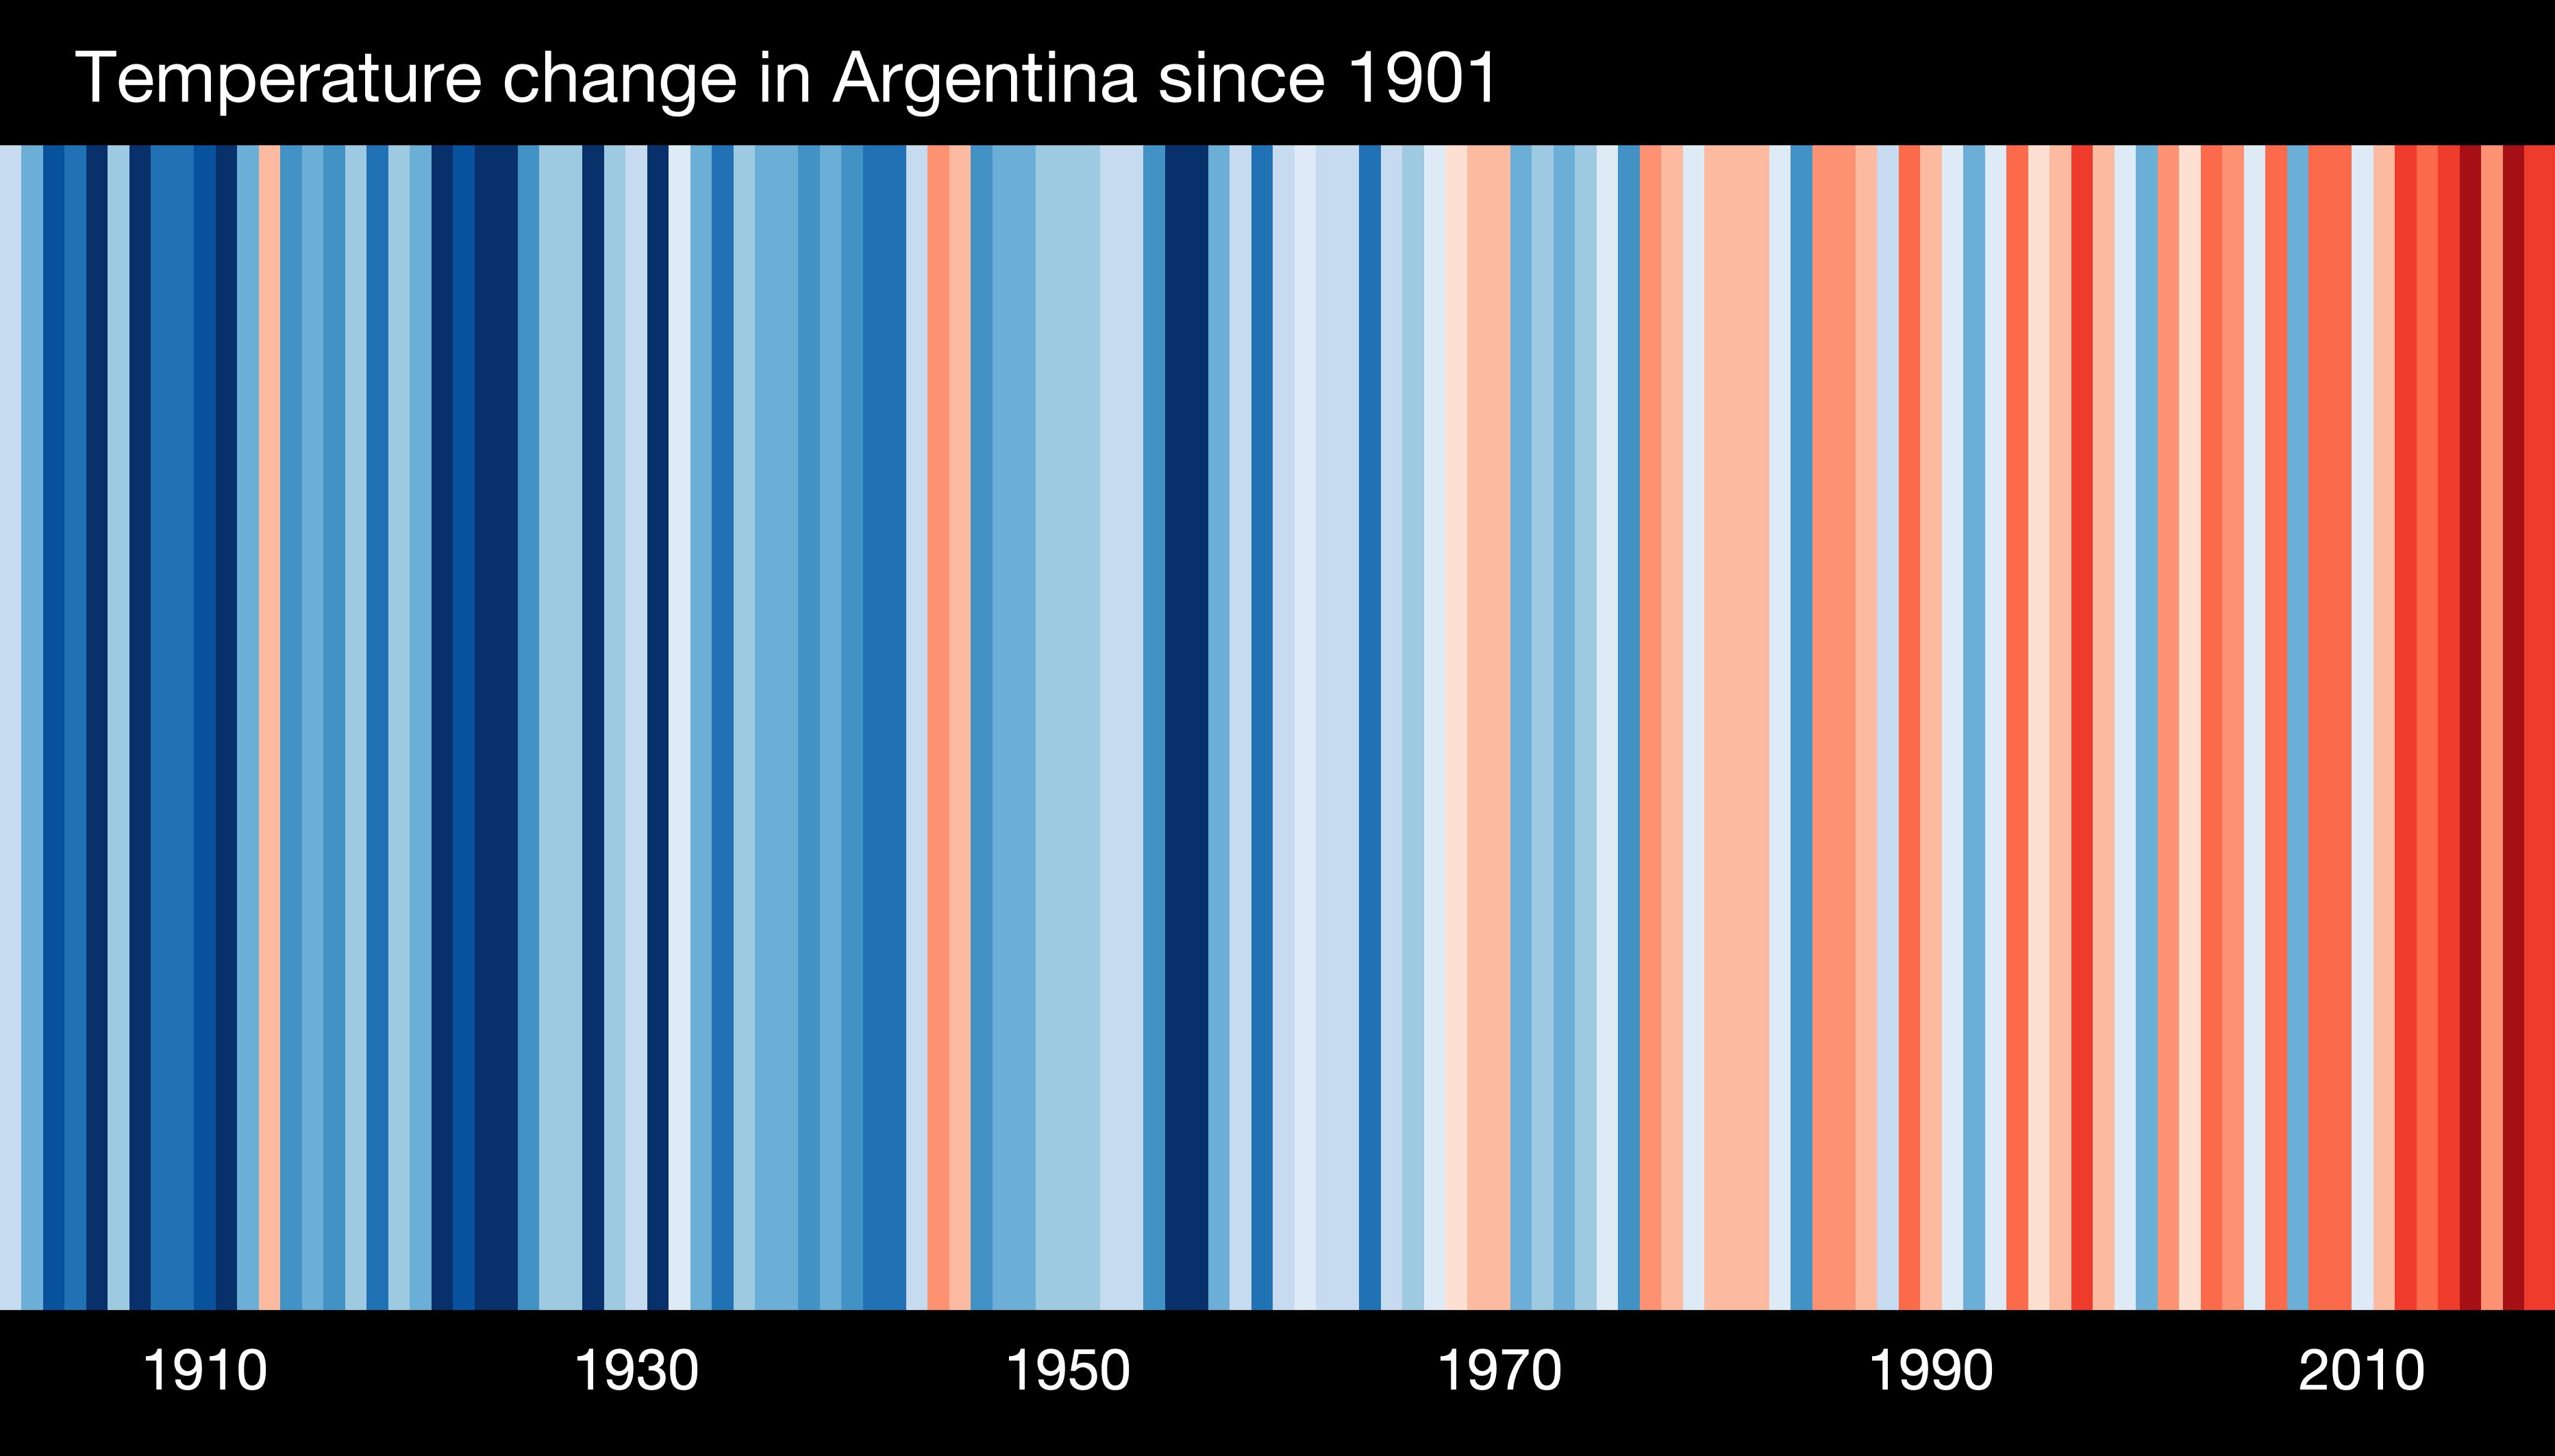 OMM-calentamiento-global-argentina